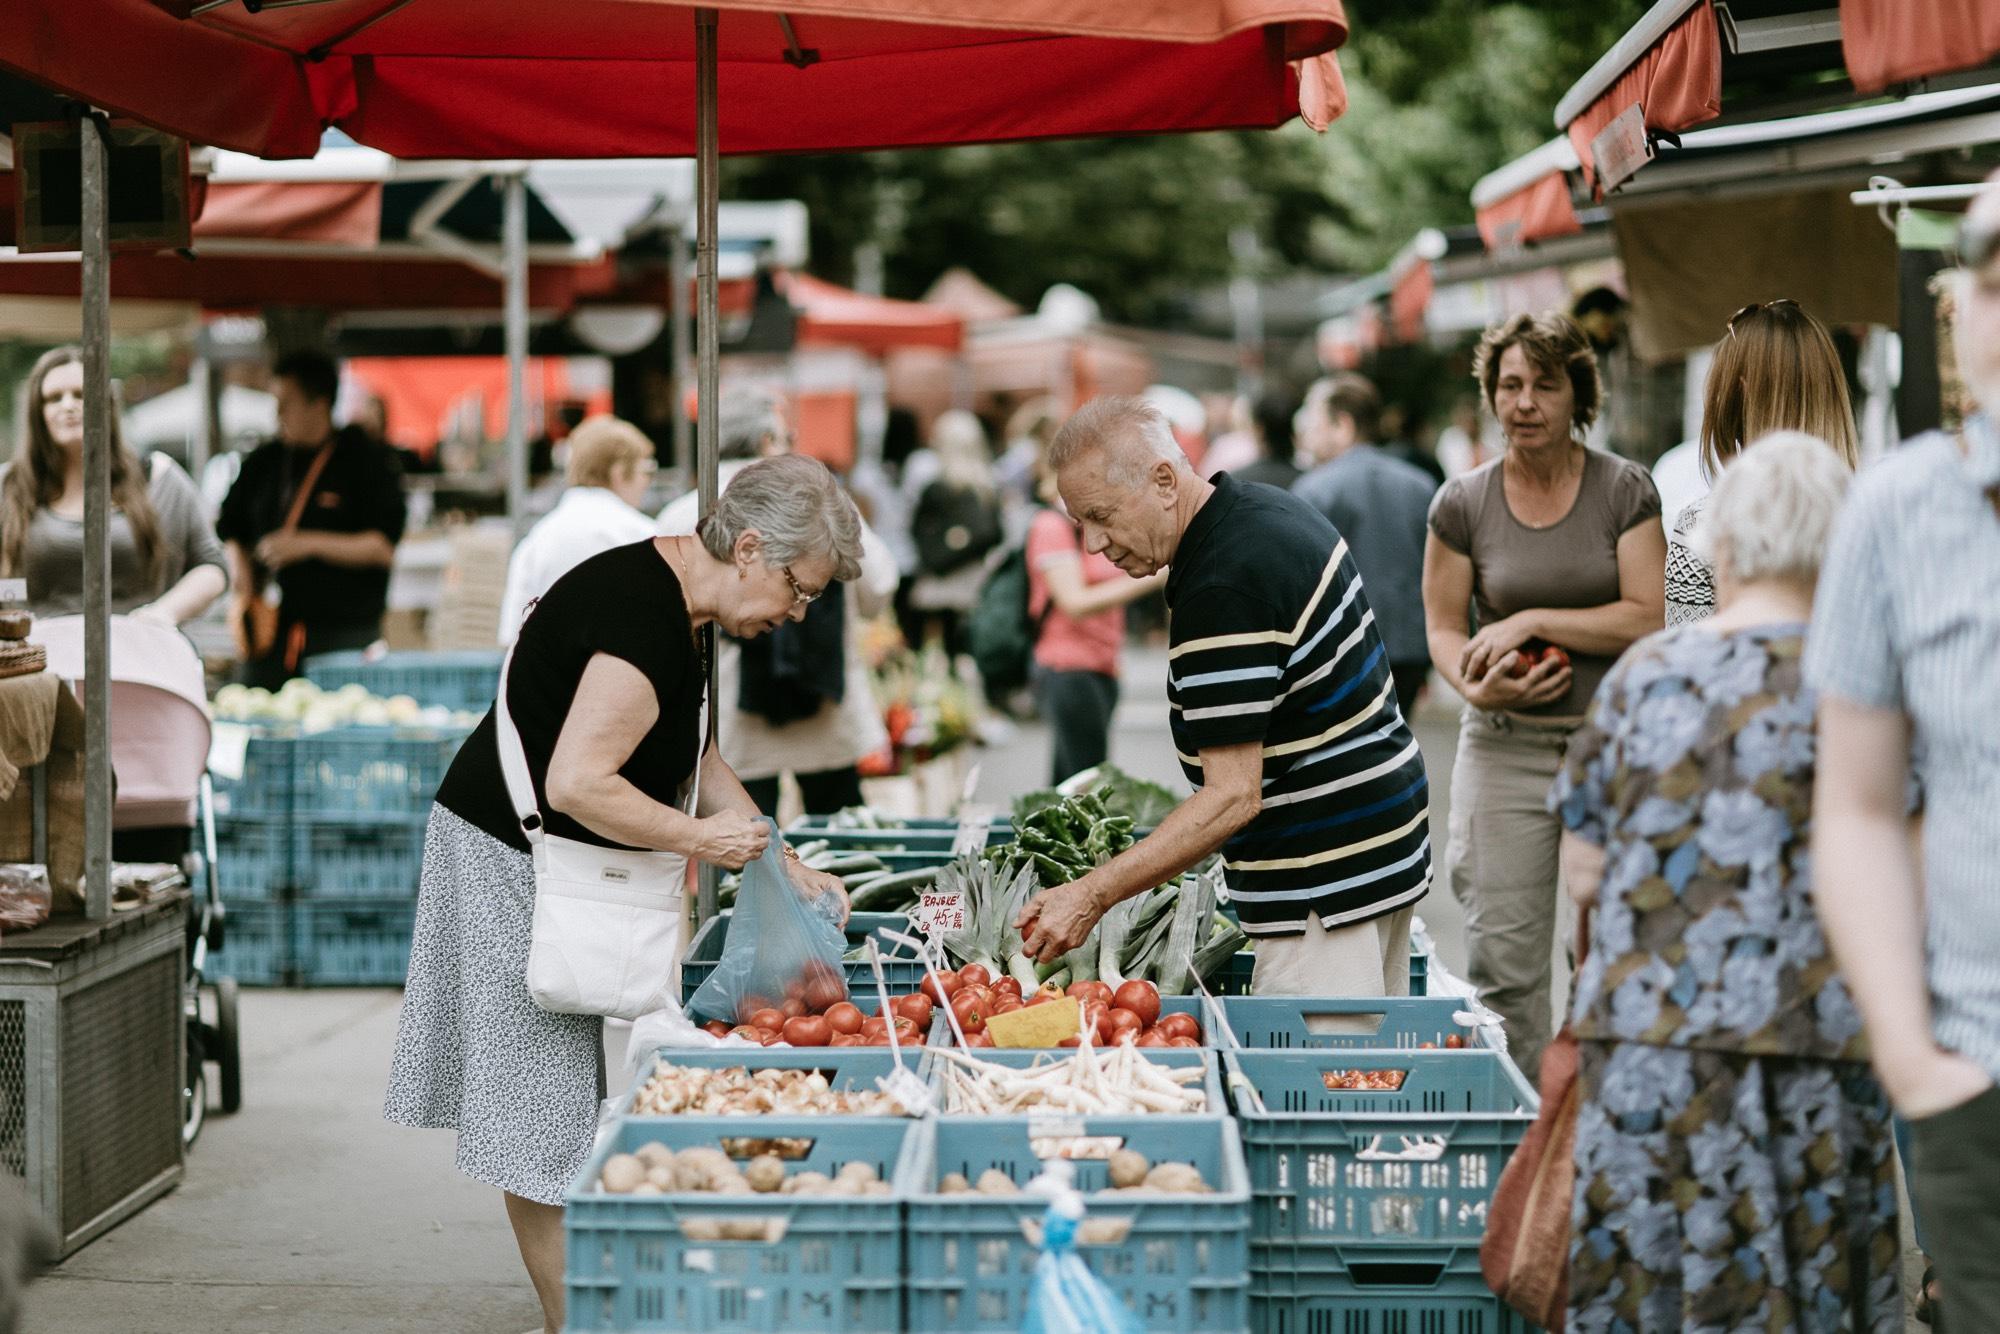 Jirak farmers market Prague